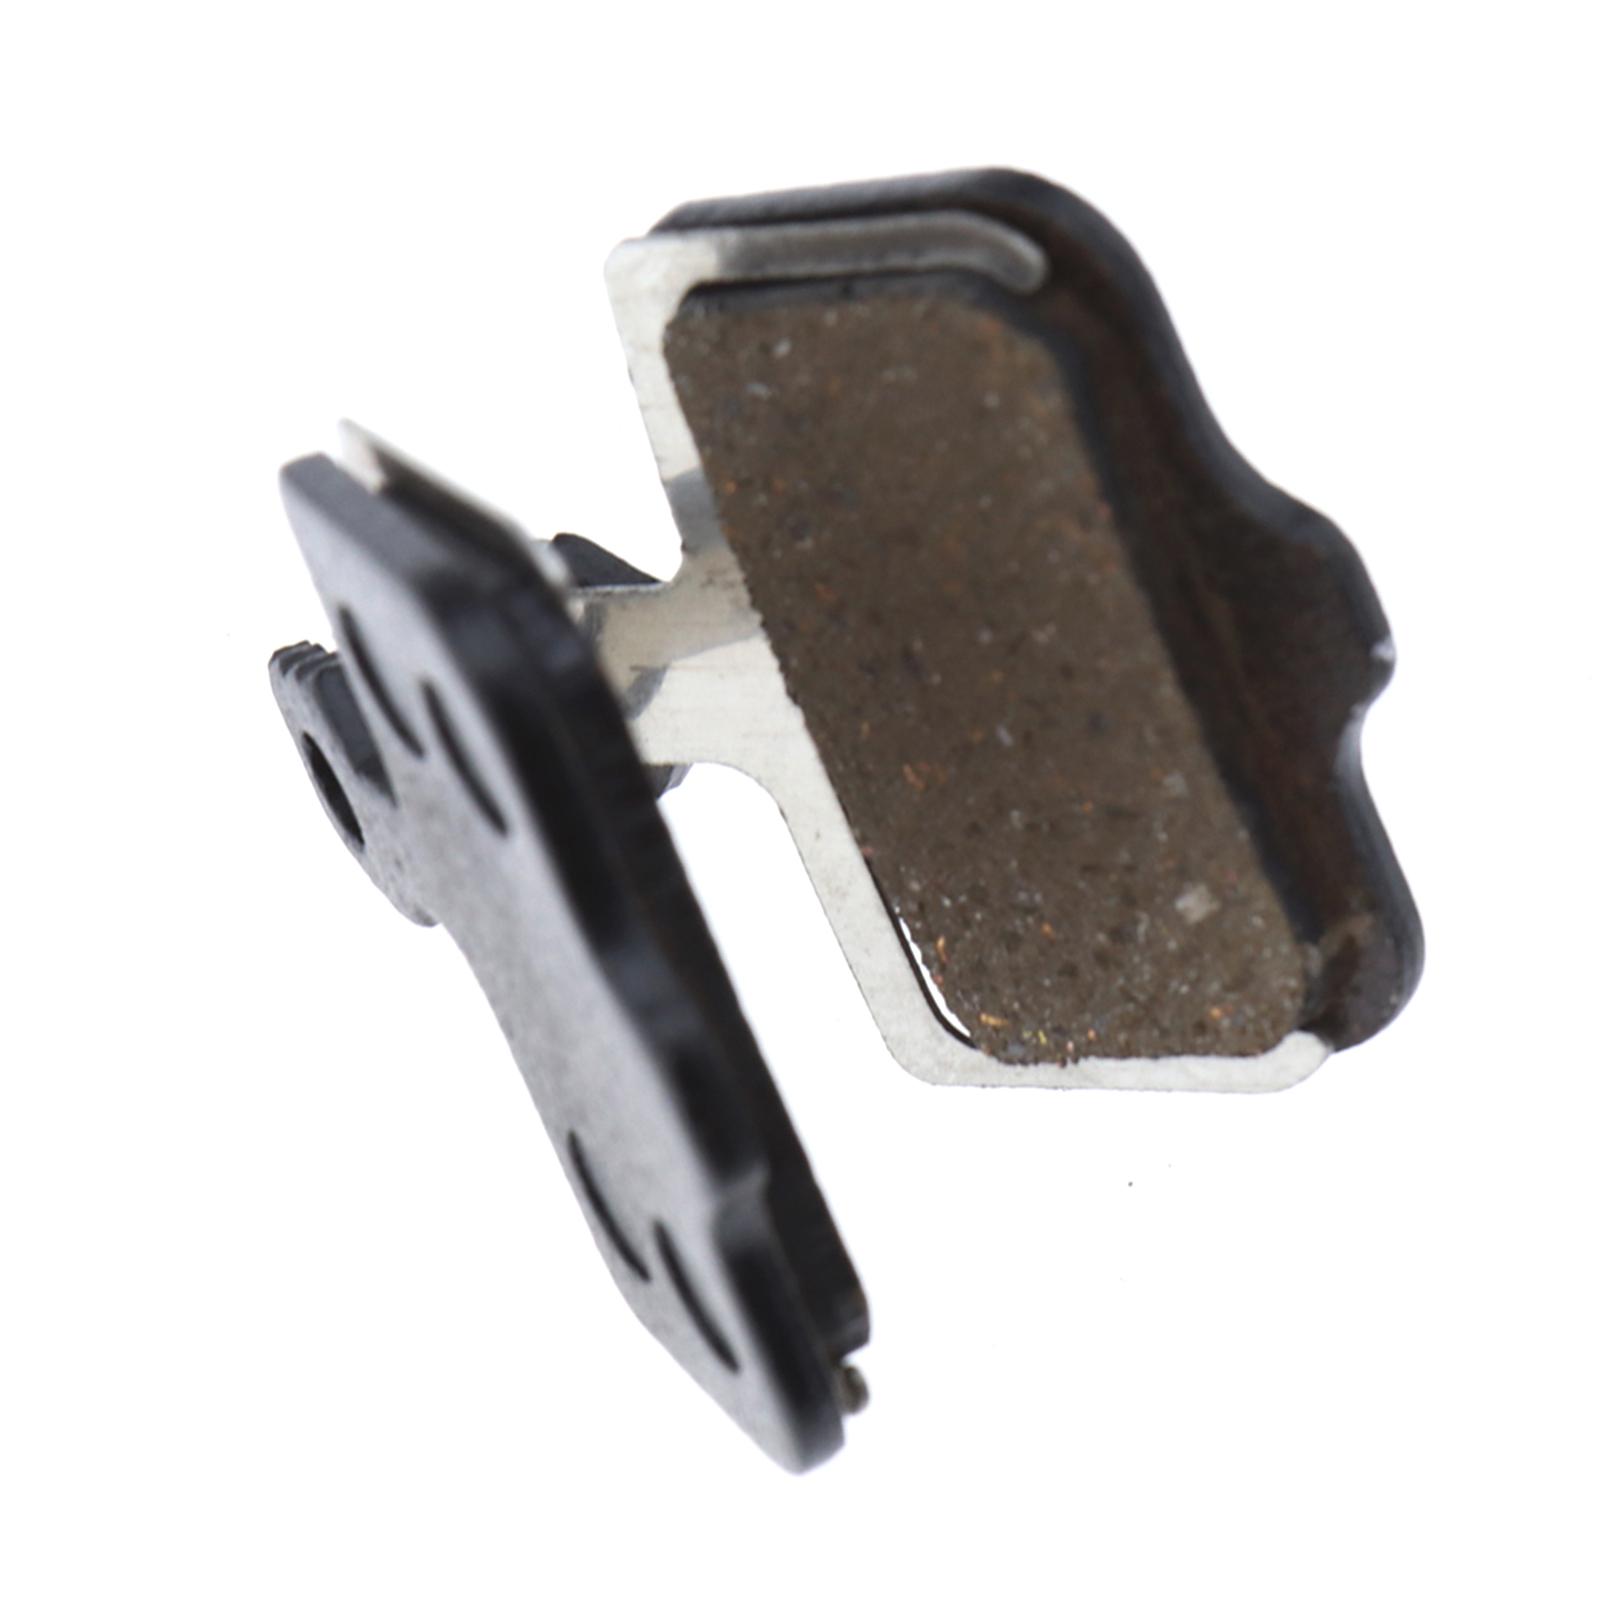 2pcs Black High Quality Resin Disc Brake Pad For Shimano Mountain Bicycle Bike